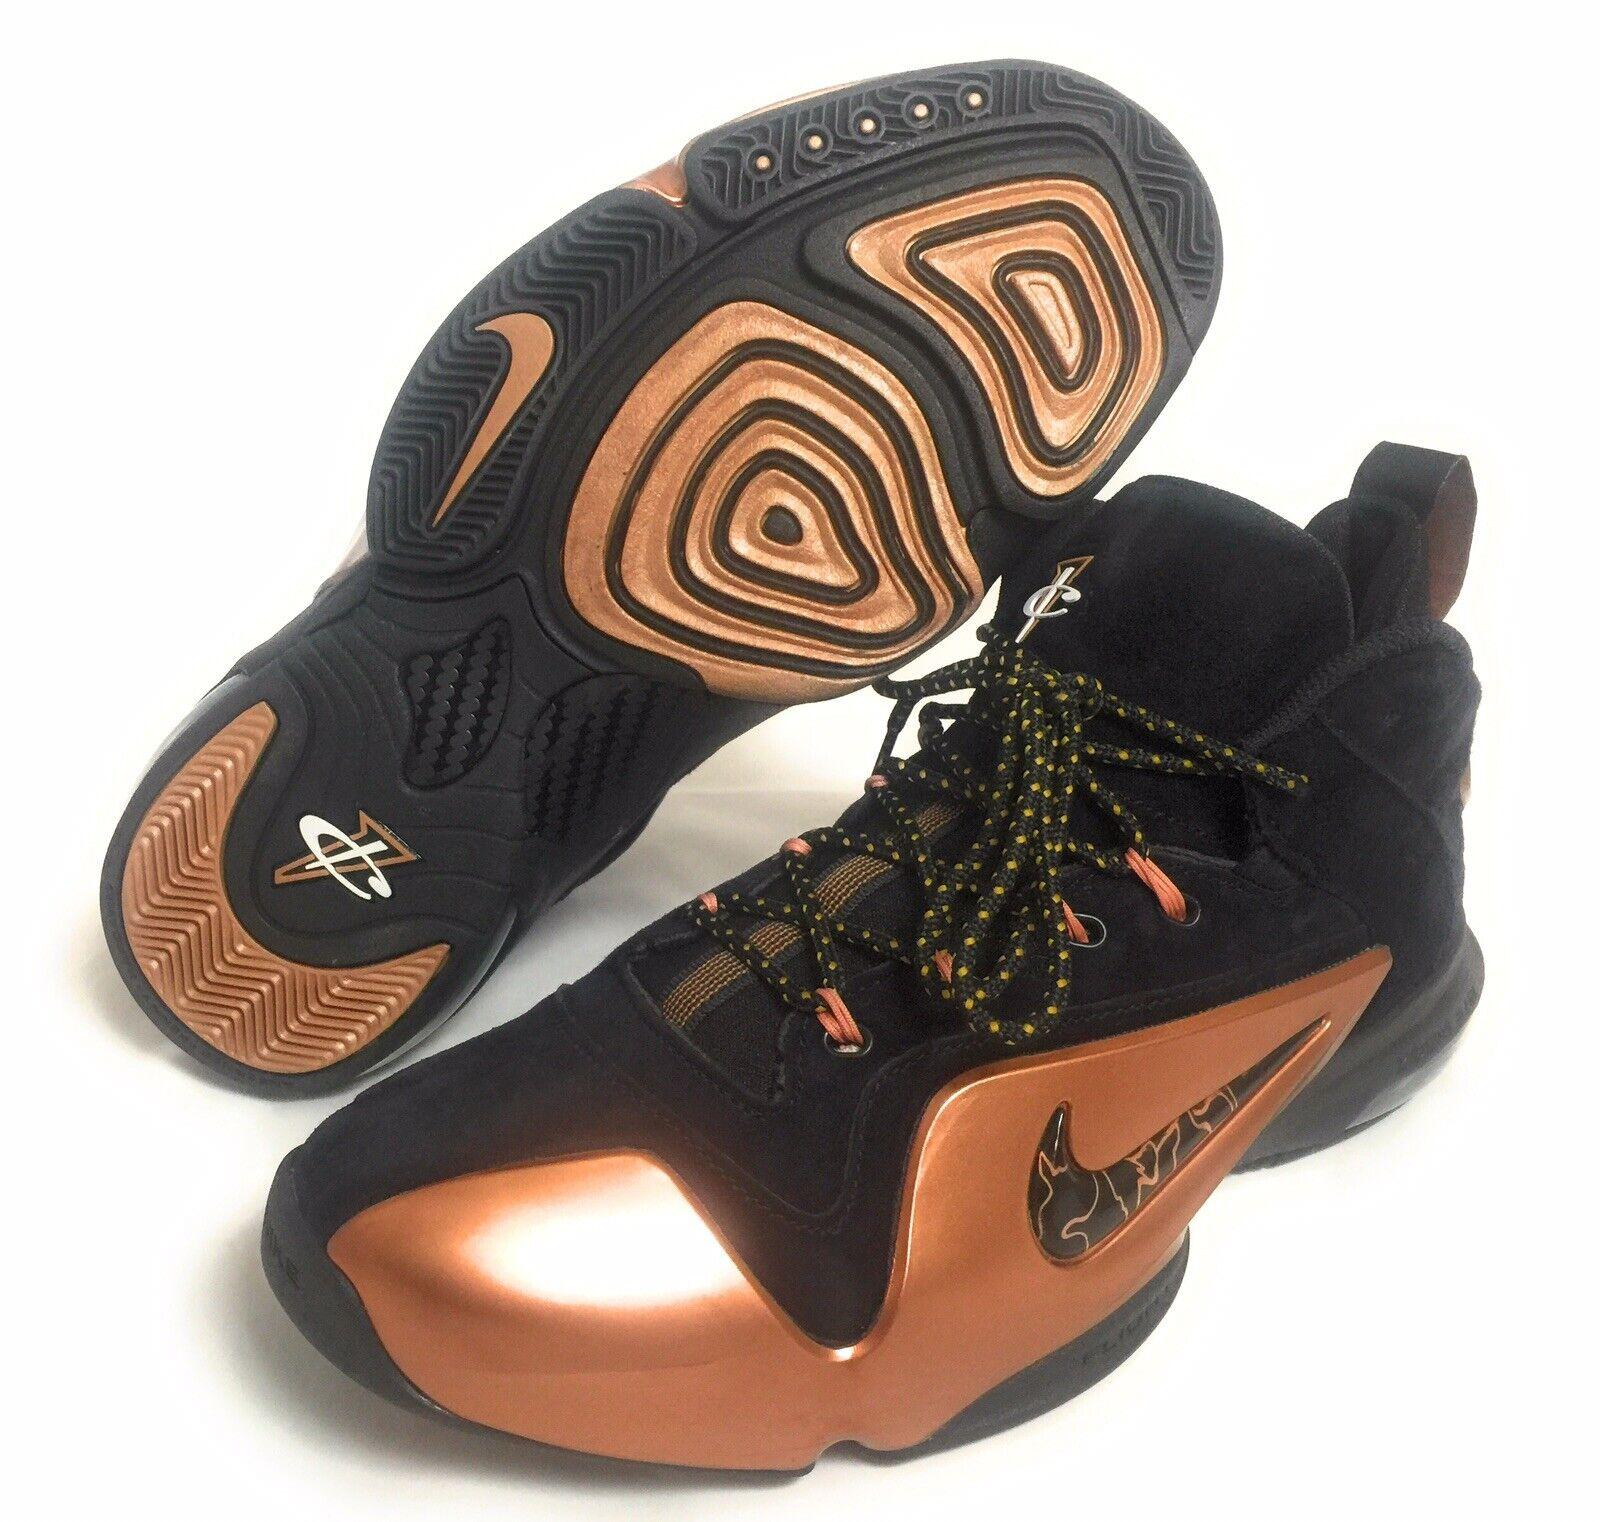 size 40 edacc 1a85d NEW Nike Zoom Penny VI 6 Men s Basketball shoes Black Black Black gold  749629-001